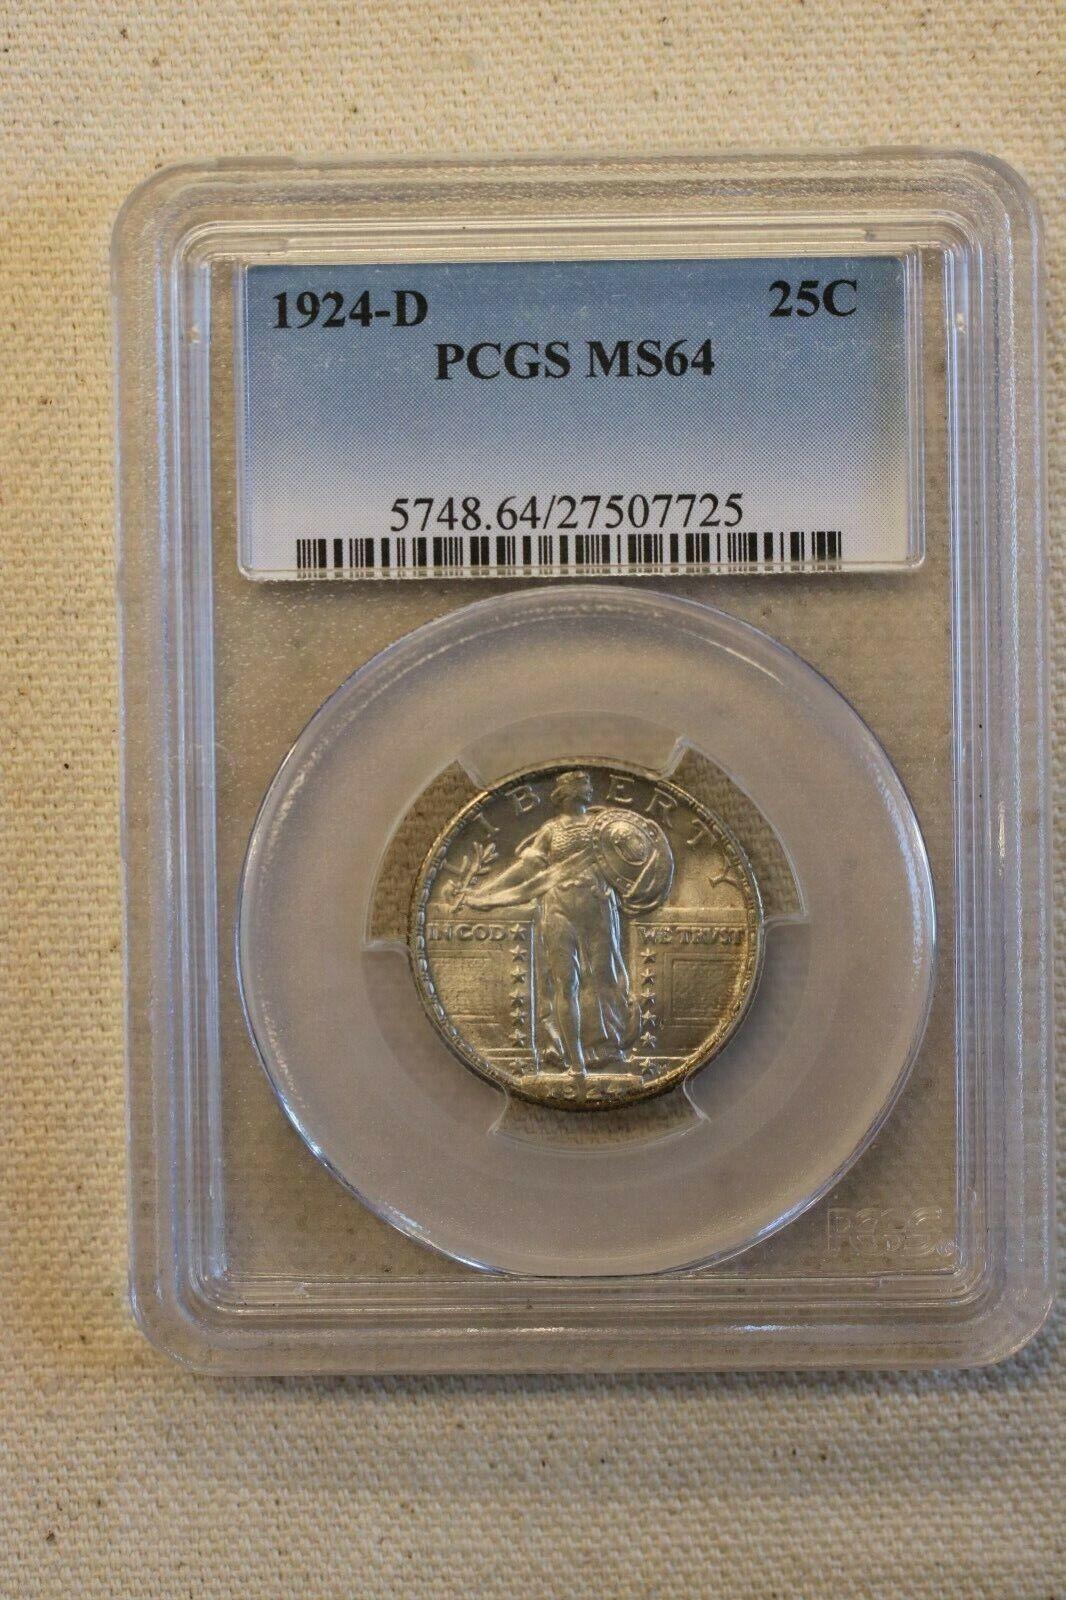 1924 D 25C Standing Liberty Quarter PCGS MS 64 Uncirculated Original - $425.00